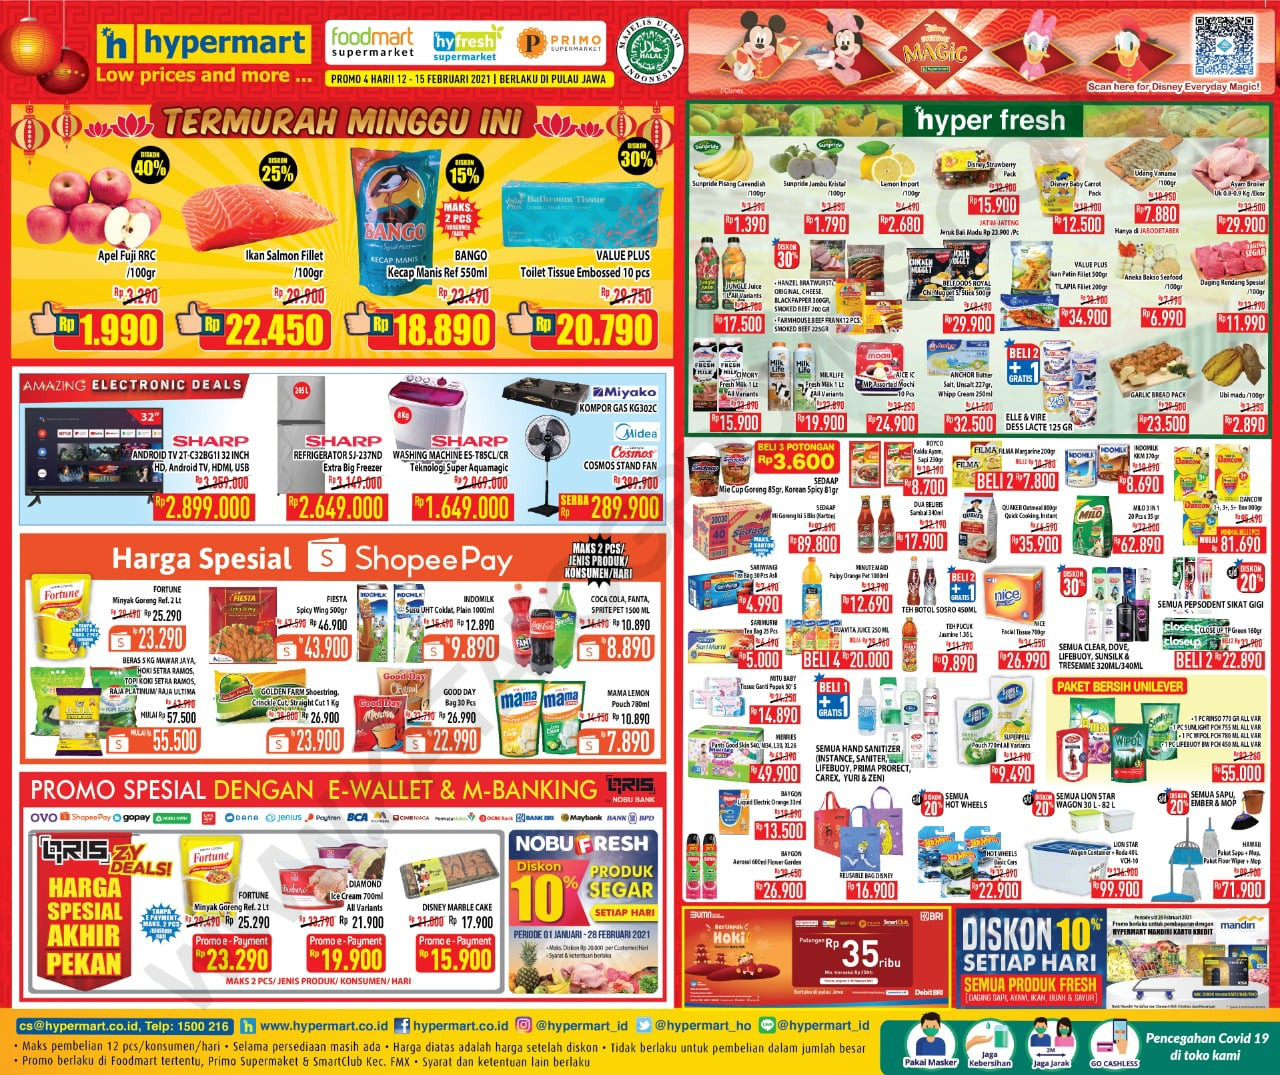 Promo Hypermart JSM Katalog Weekend periode 12-15 Februari 2021